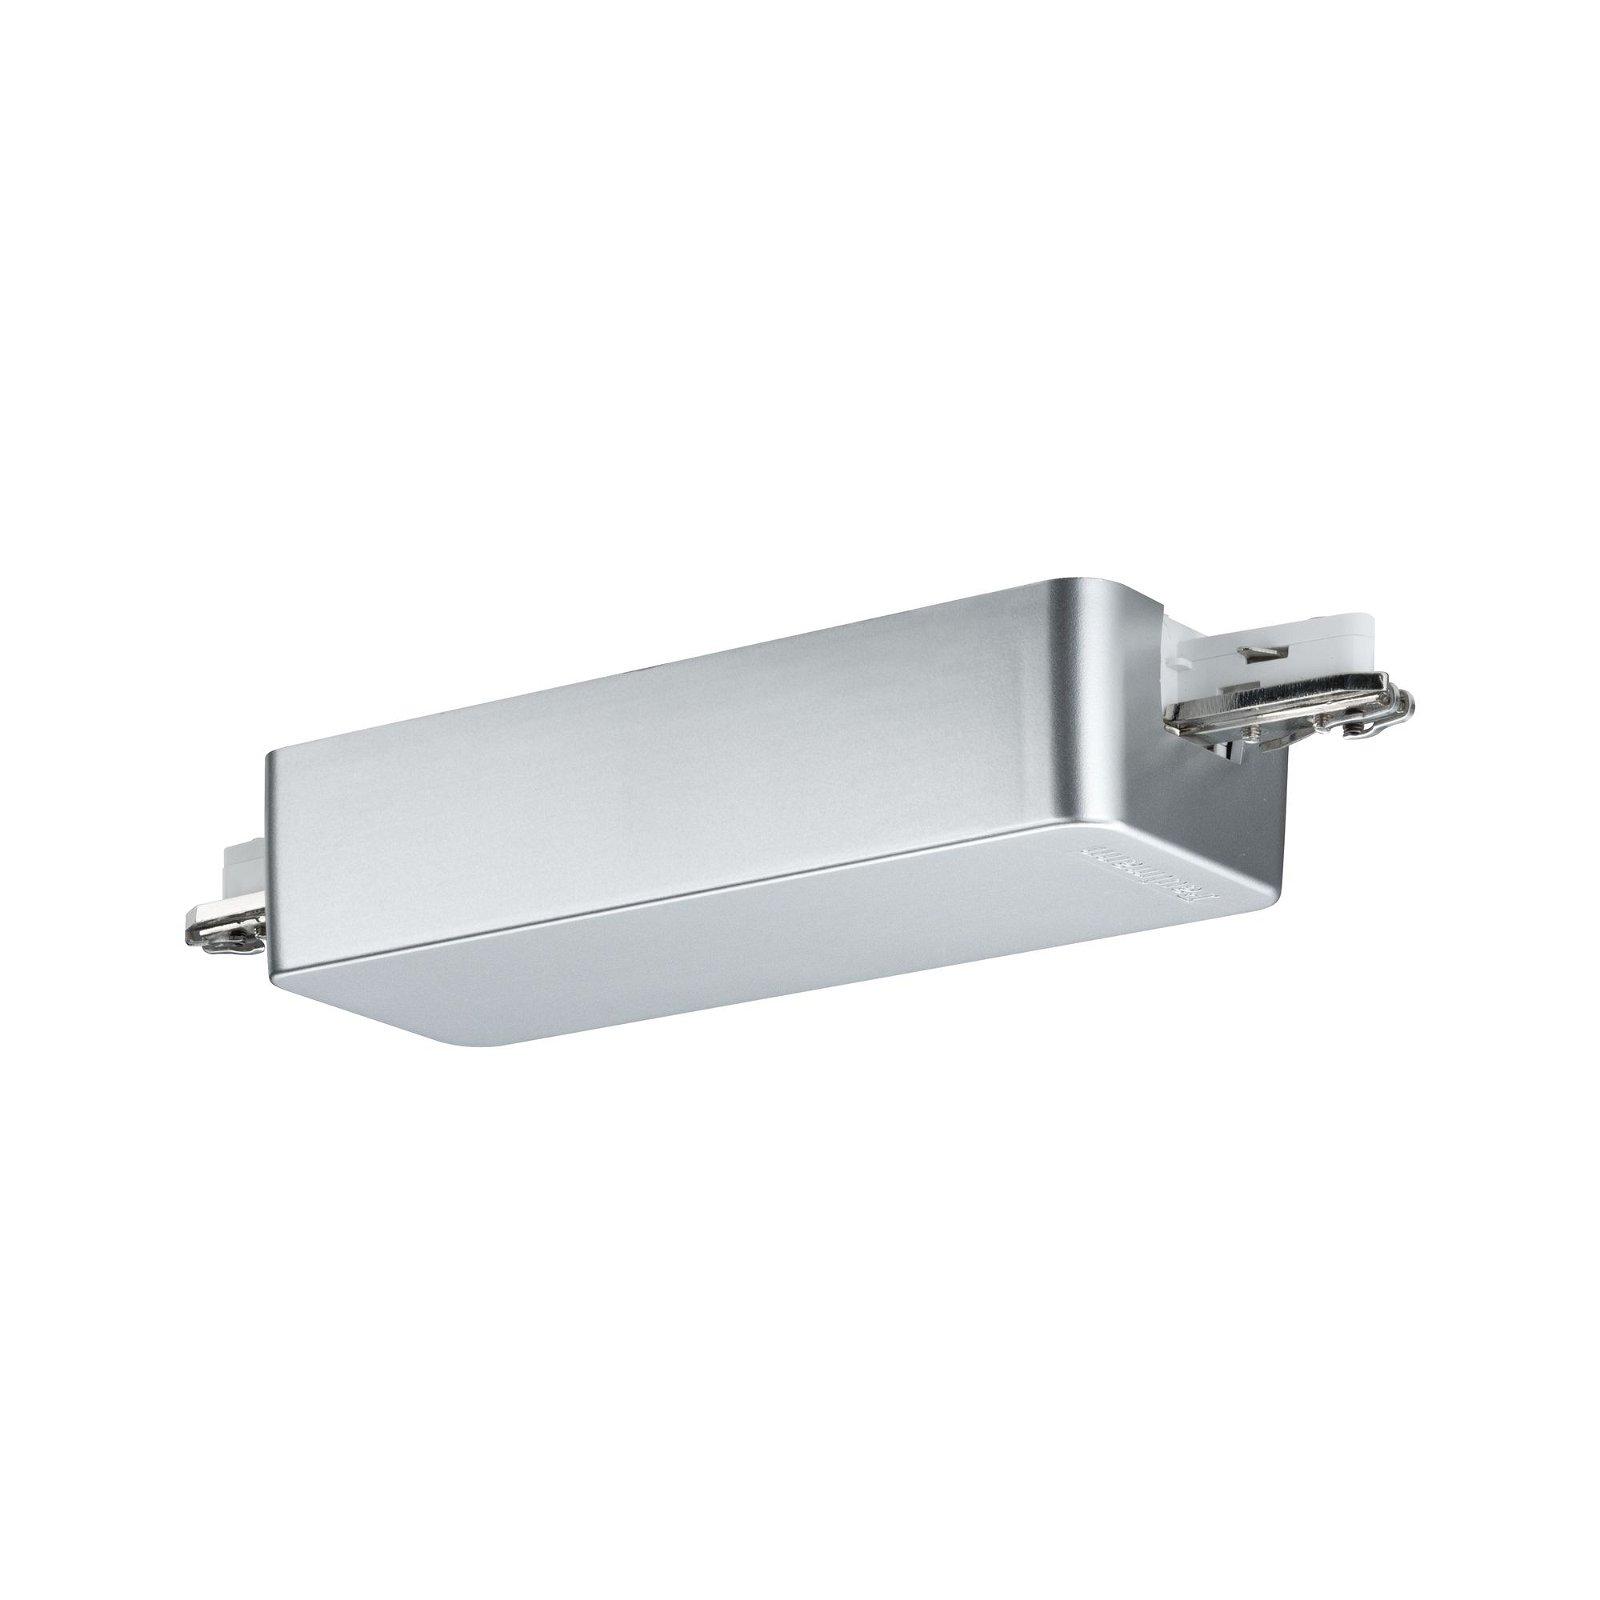 URail Railadapter Dimm/Switch 155x56mm Chroom mat